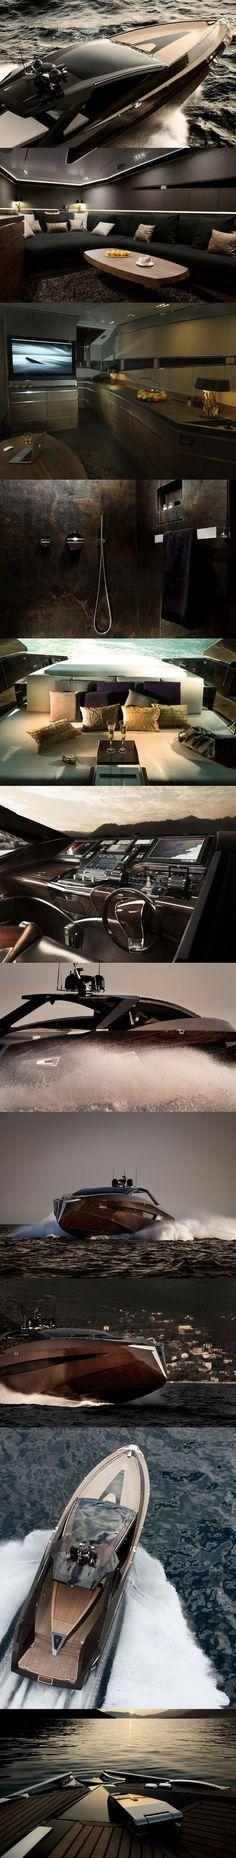 Art of Kinetik Hedonist Yacht, #celebritys sport cars #luxury sports cars| http://sport-cars.kira.flappyhouse.com